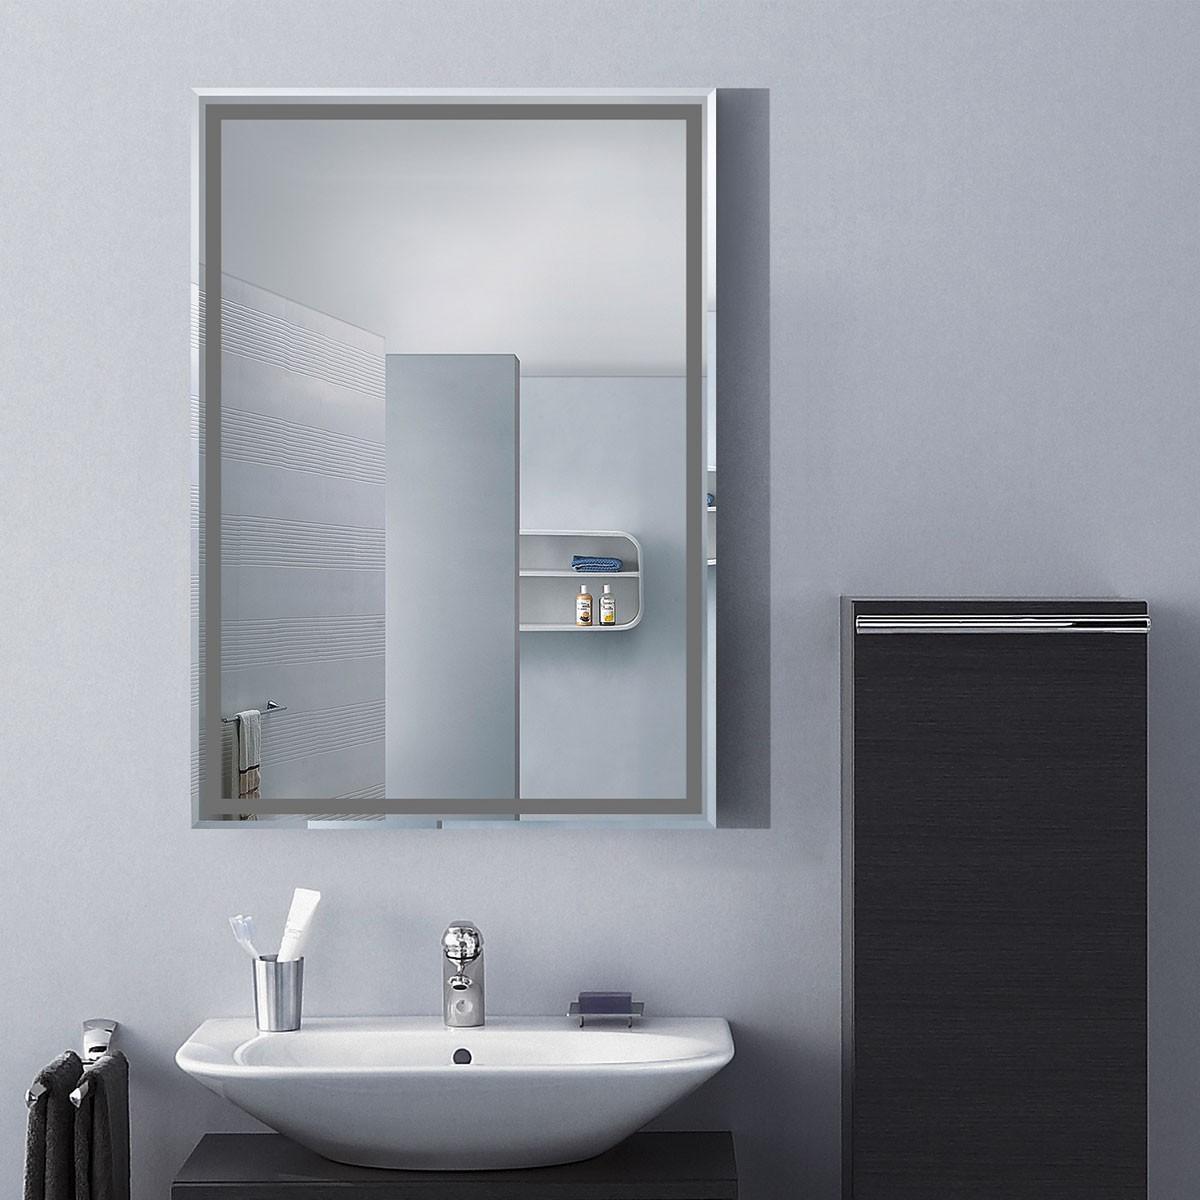 28 x 20 po miroir mural salle de bain classique for Salle de bain rectangulaire 8m2